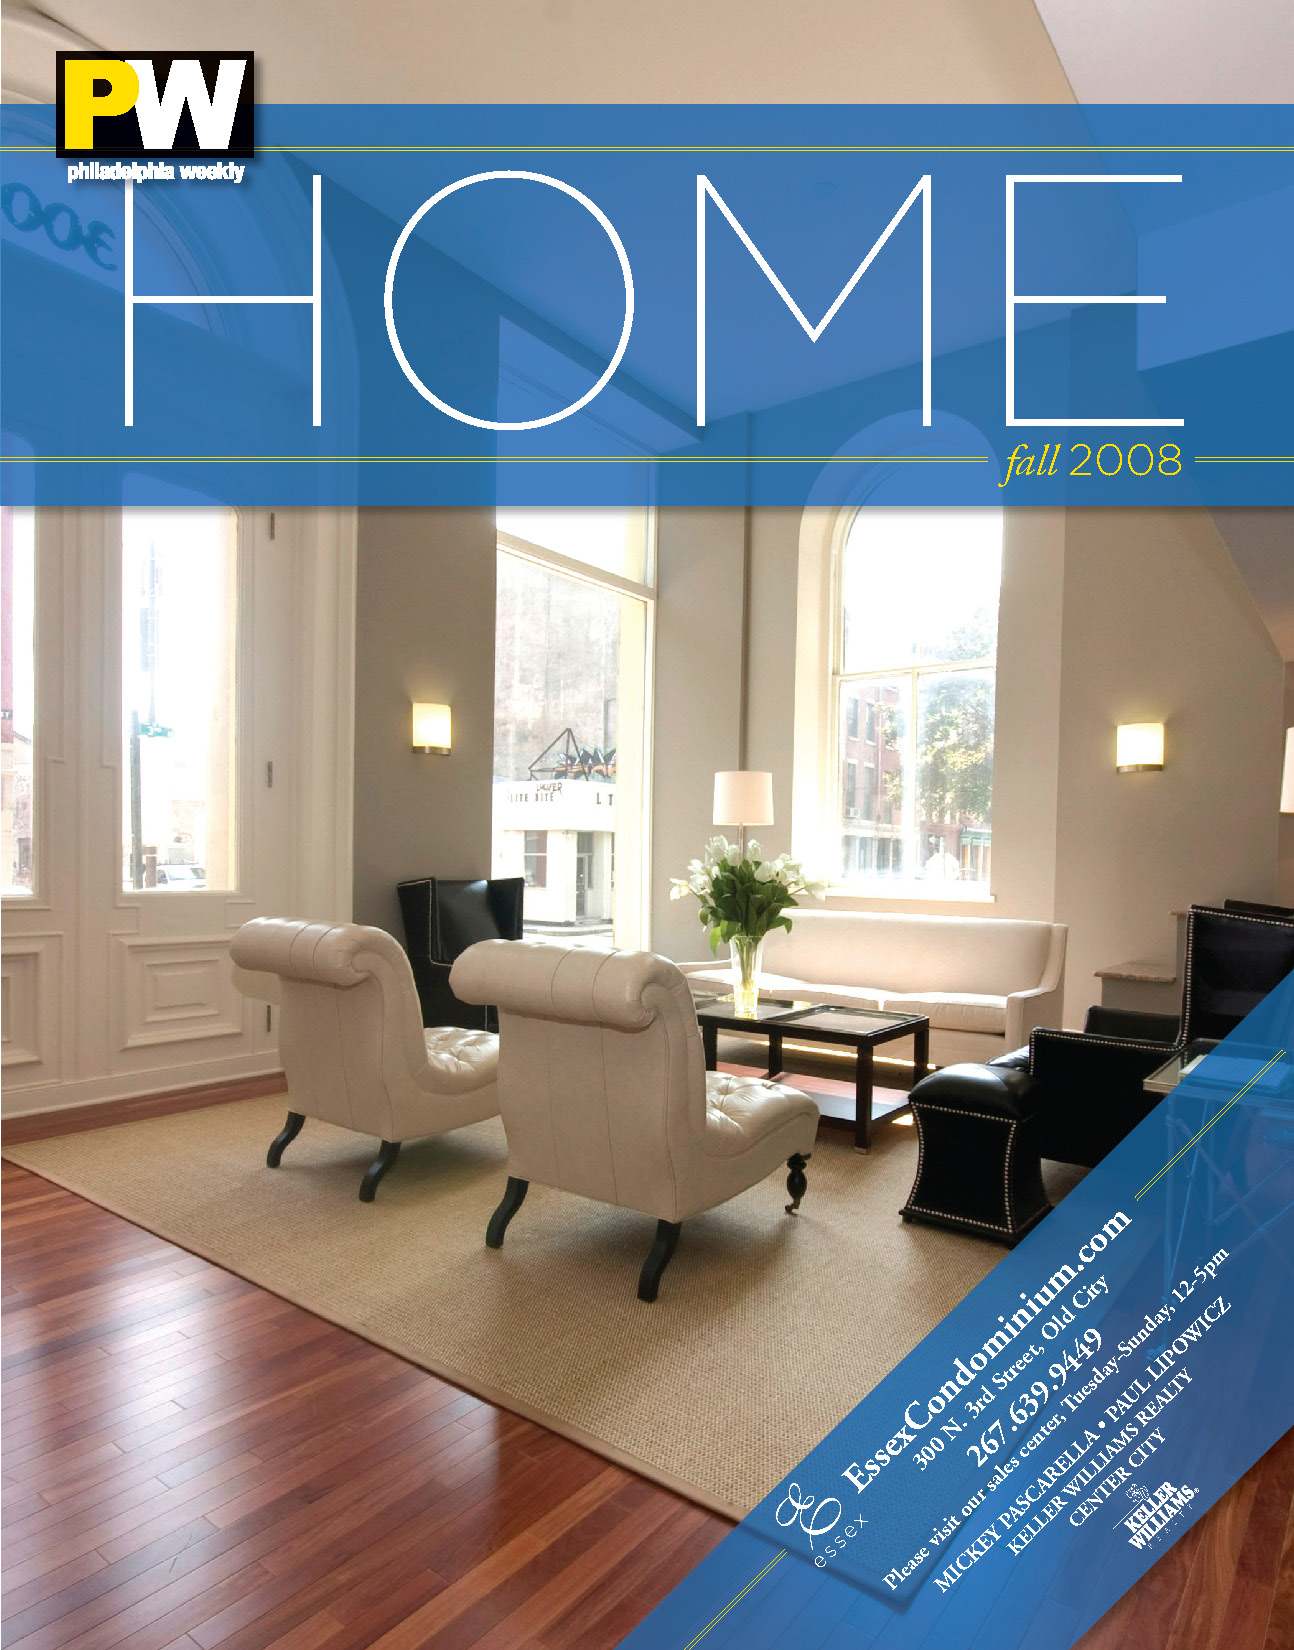 vertical real estate magazine cover design trend home